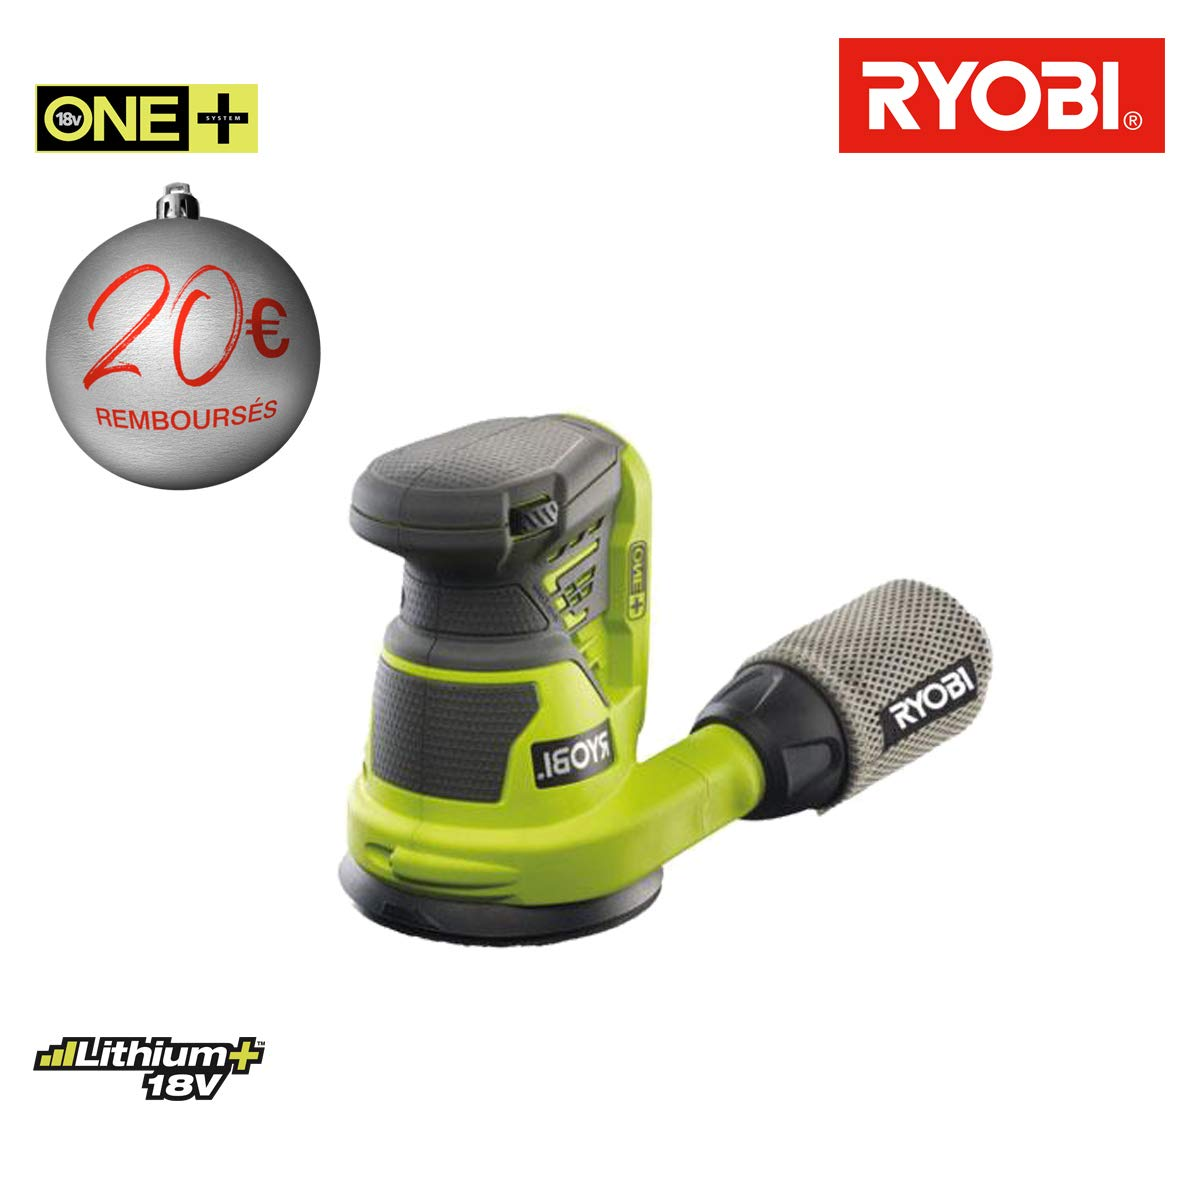 Ponceuse excentrique RYOBI 18 V OnePlus sans batterie ni chargeur R18ROS-0 Ryobi Tools